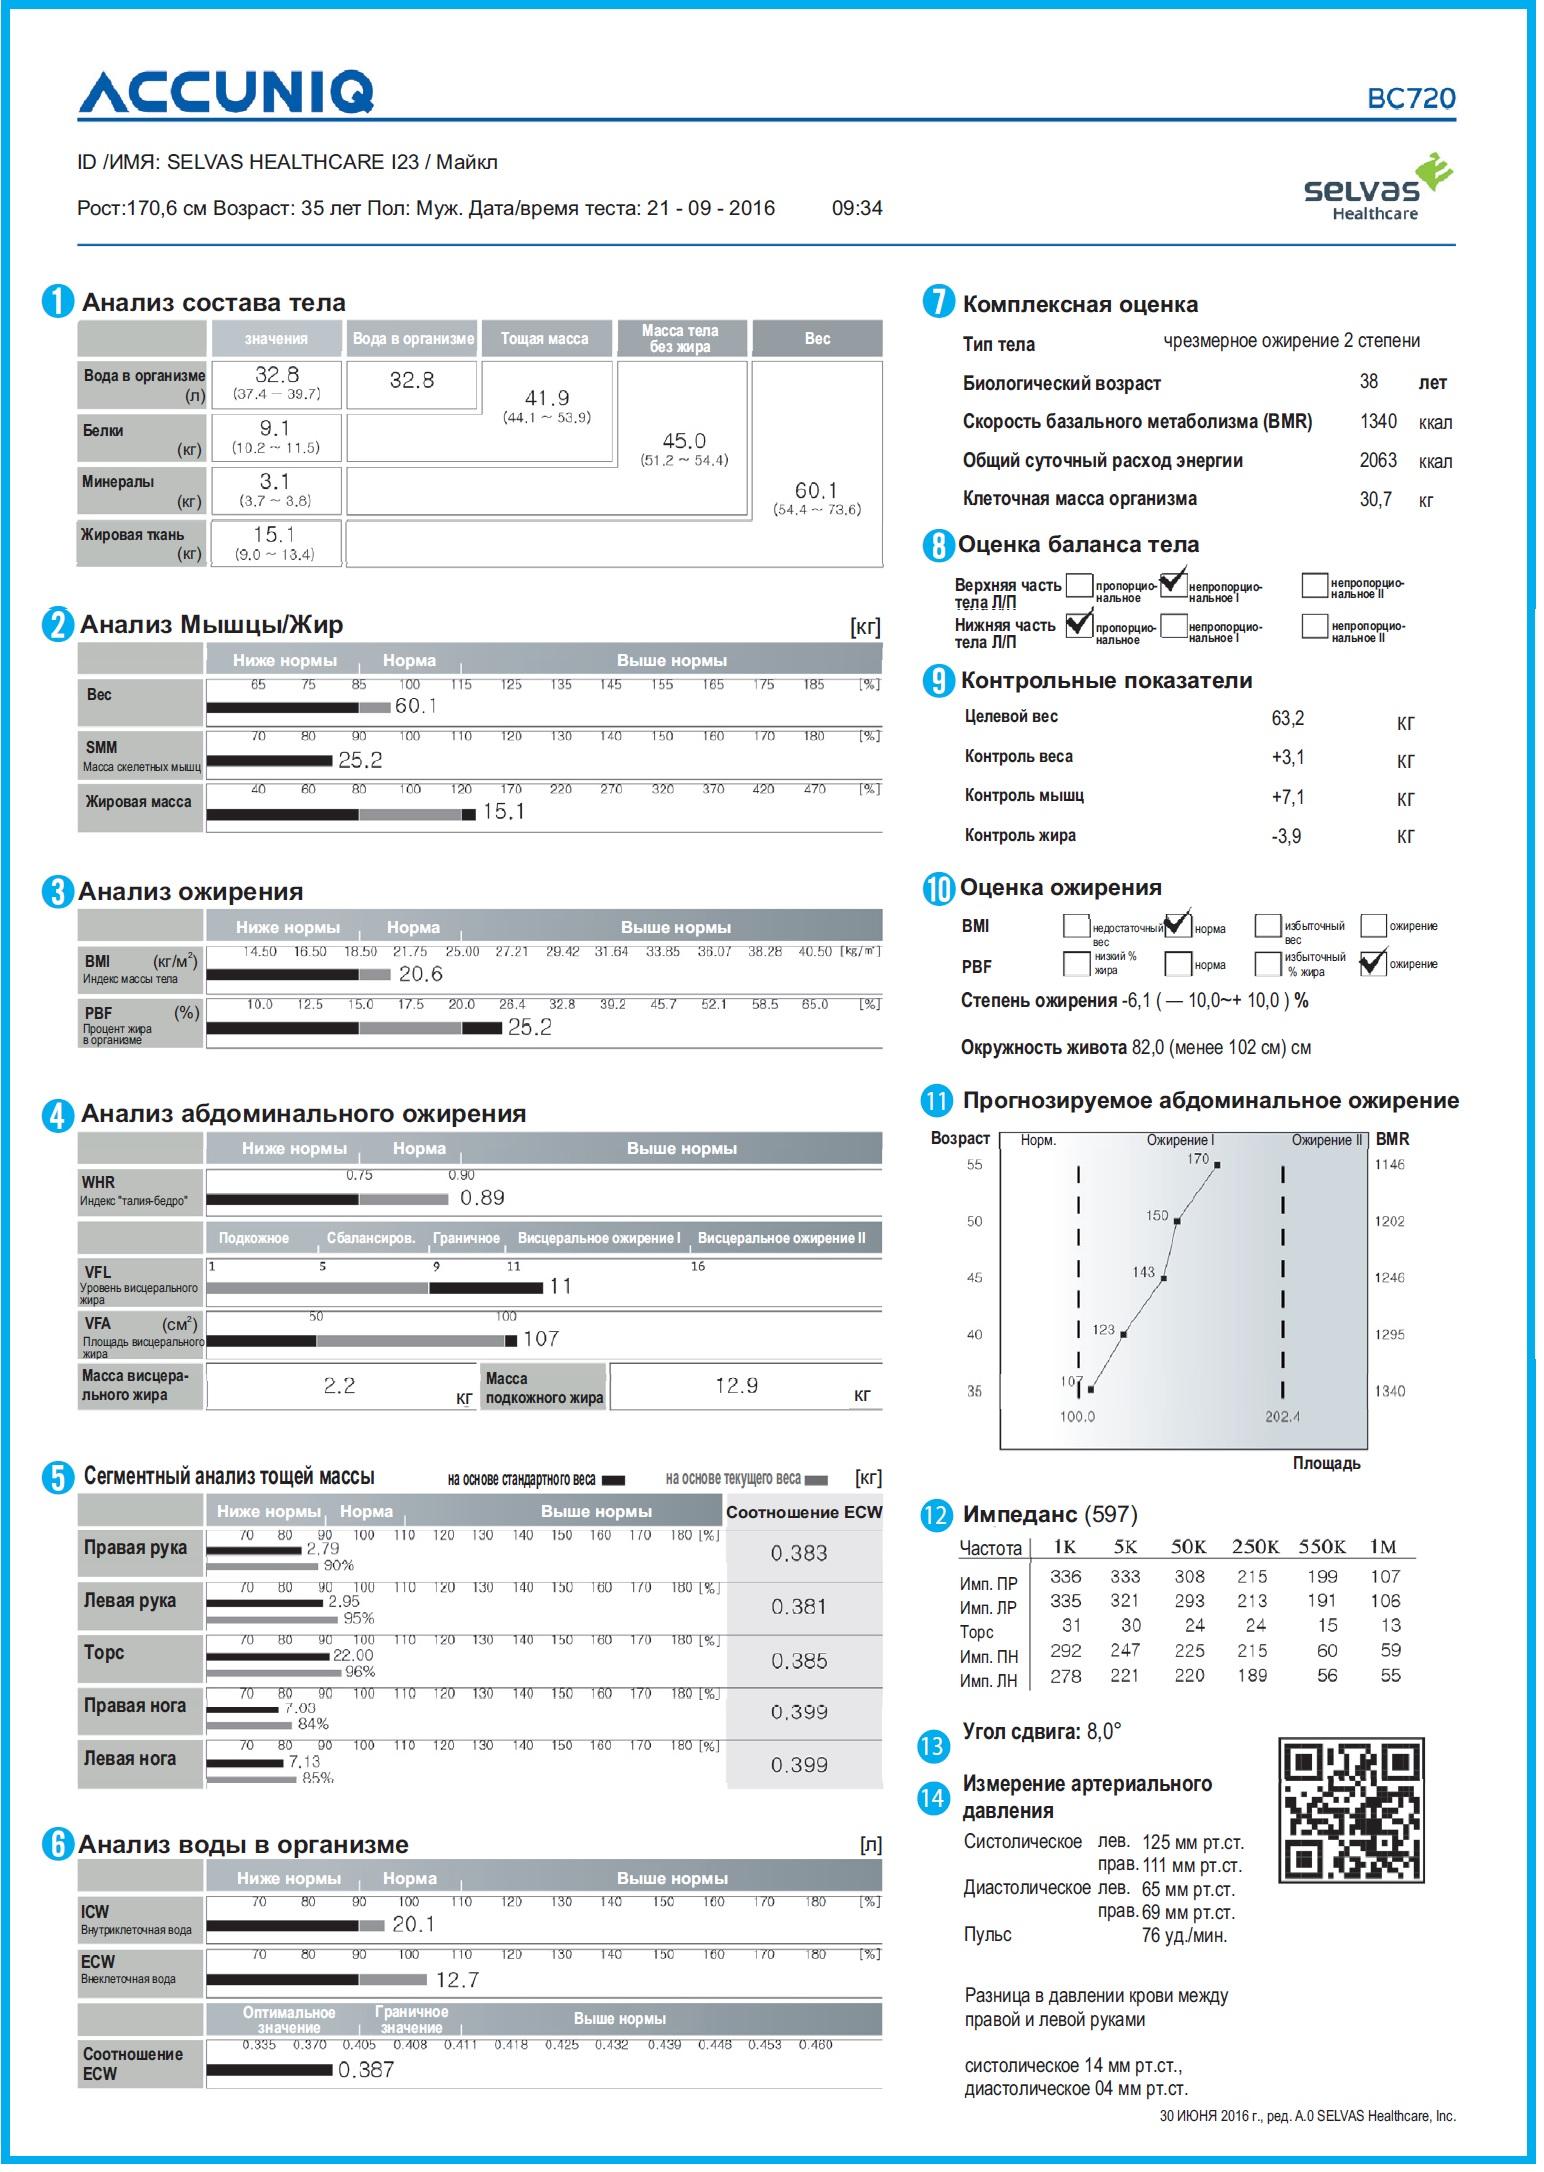 ACCUNIQ BC720 лист результатов